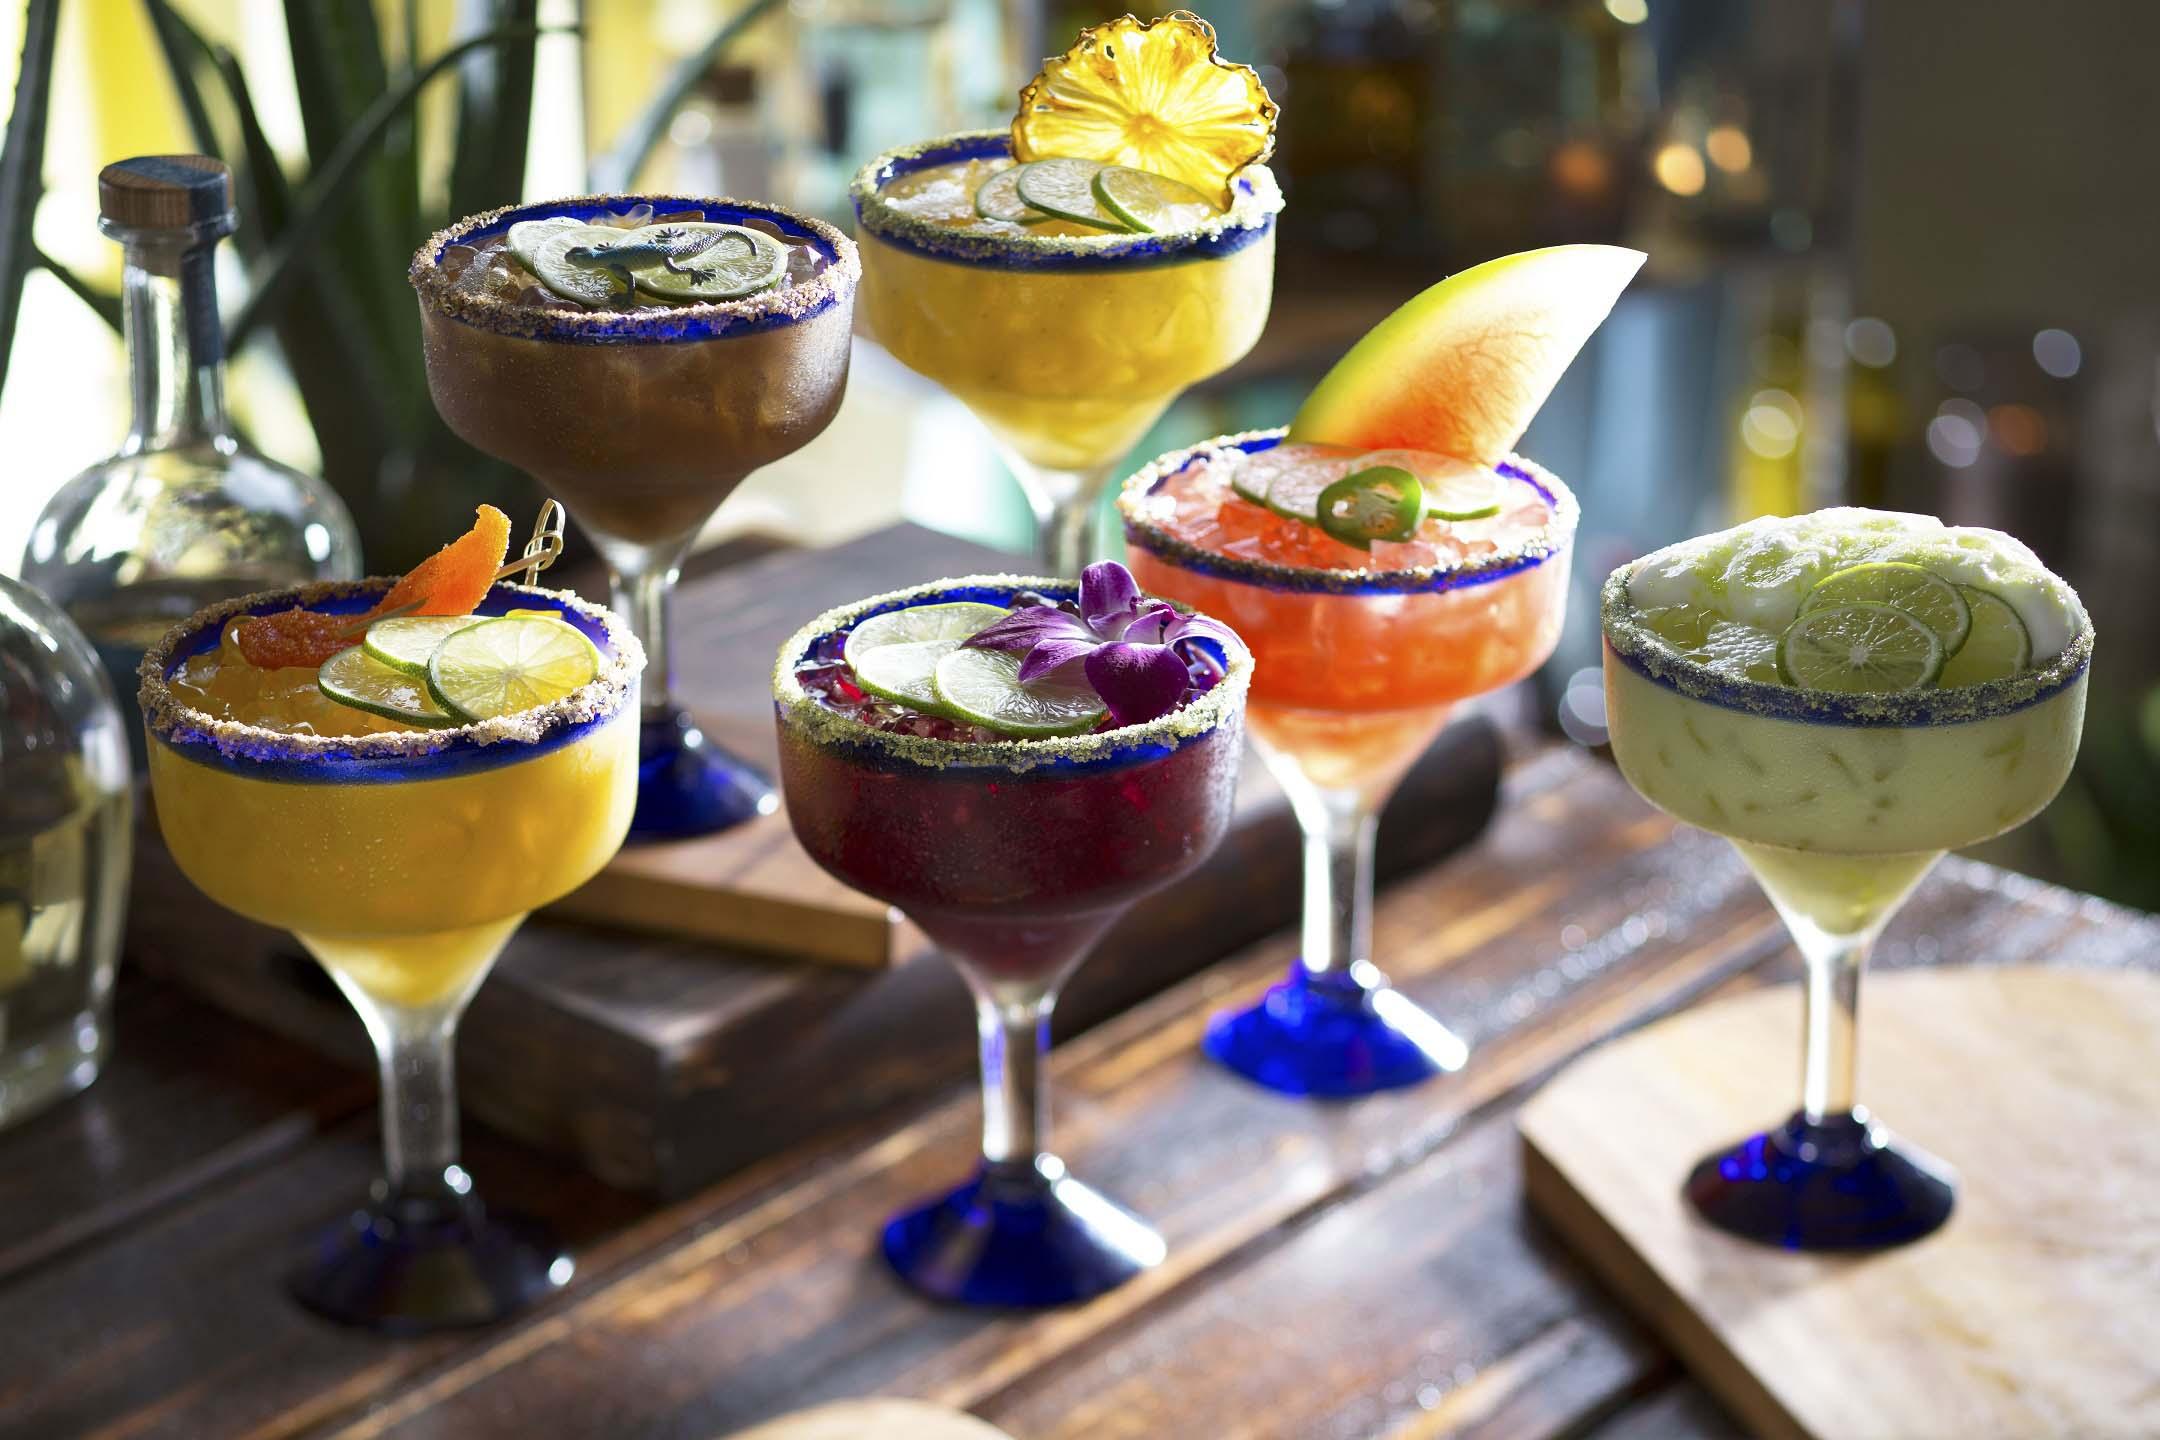 Enjoy one of the many margarita selections at Bahama Breeze, including Tamarind Margarita, Hibiscus Margarita and more!